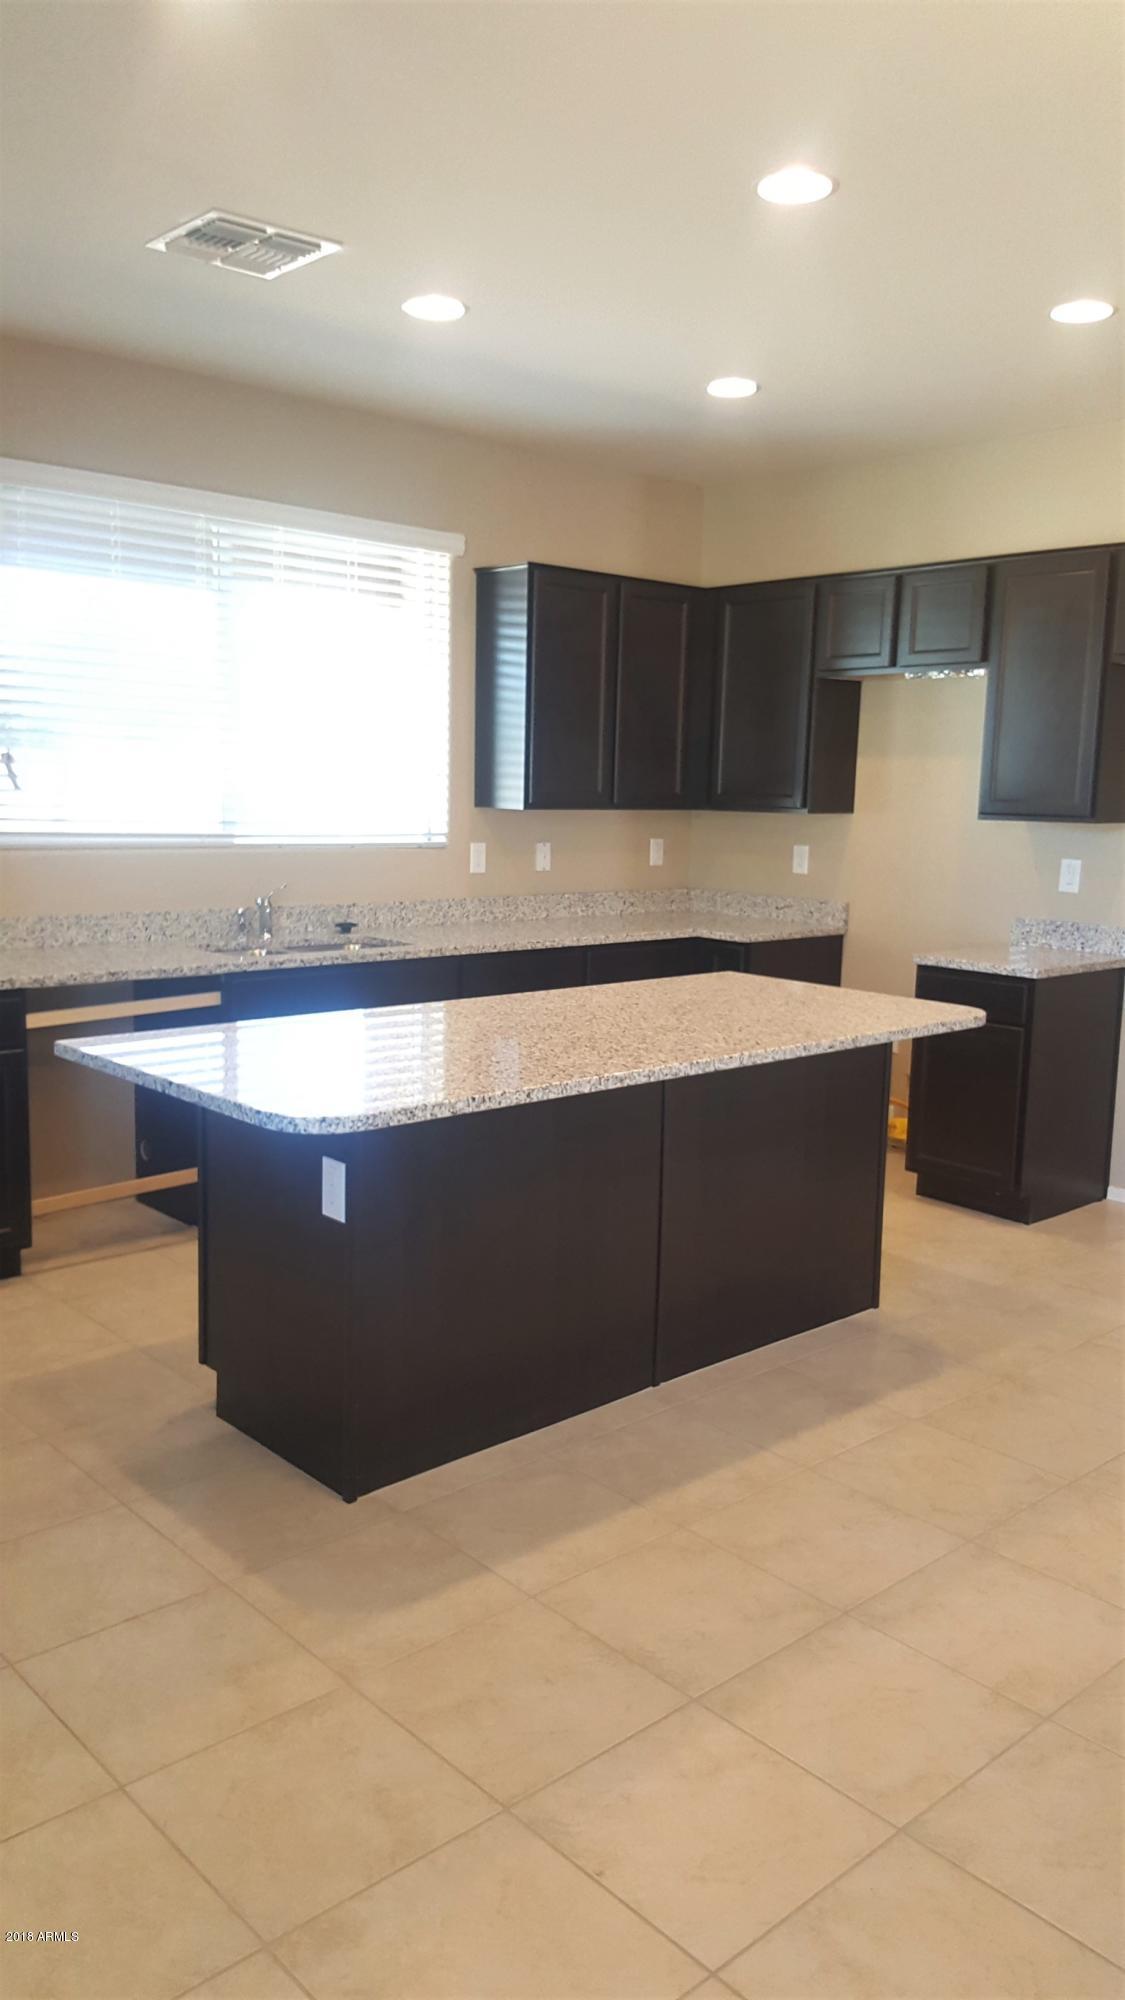 MLS 5731921 2620 S 116TH Drive, Avondale, AZ 85323 Avondale AZ Newly Built